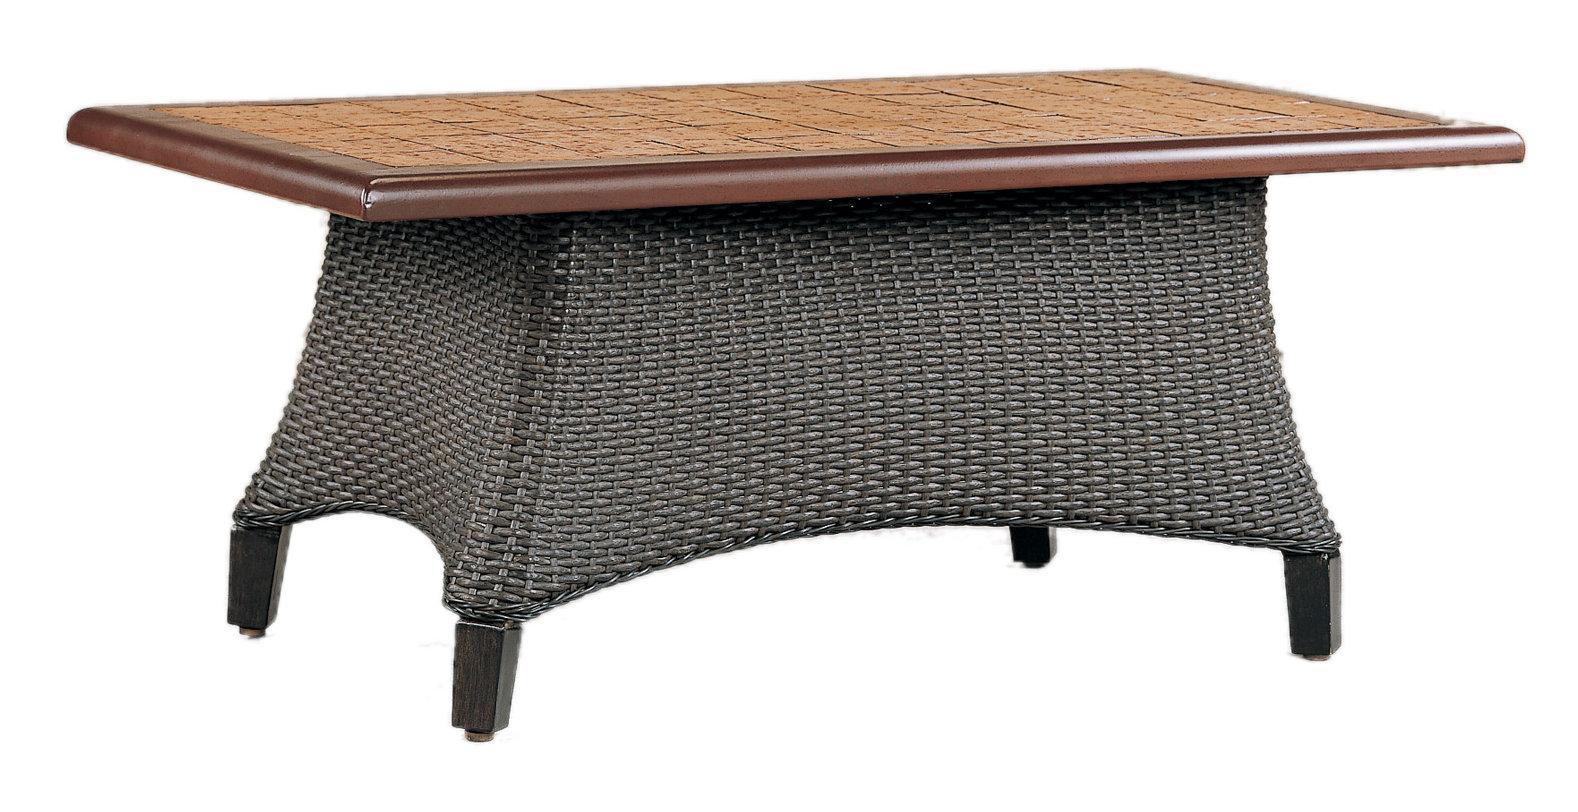 "970135B Monterey Coffee Table Base   (top : CS-2346 Grandeur Aluminum Faux Stone Top)  34.3"" x 20.5"" x 17.8"""